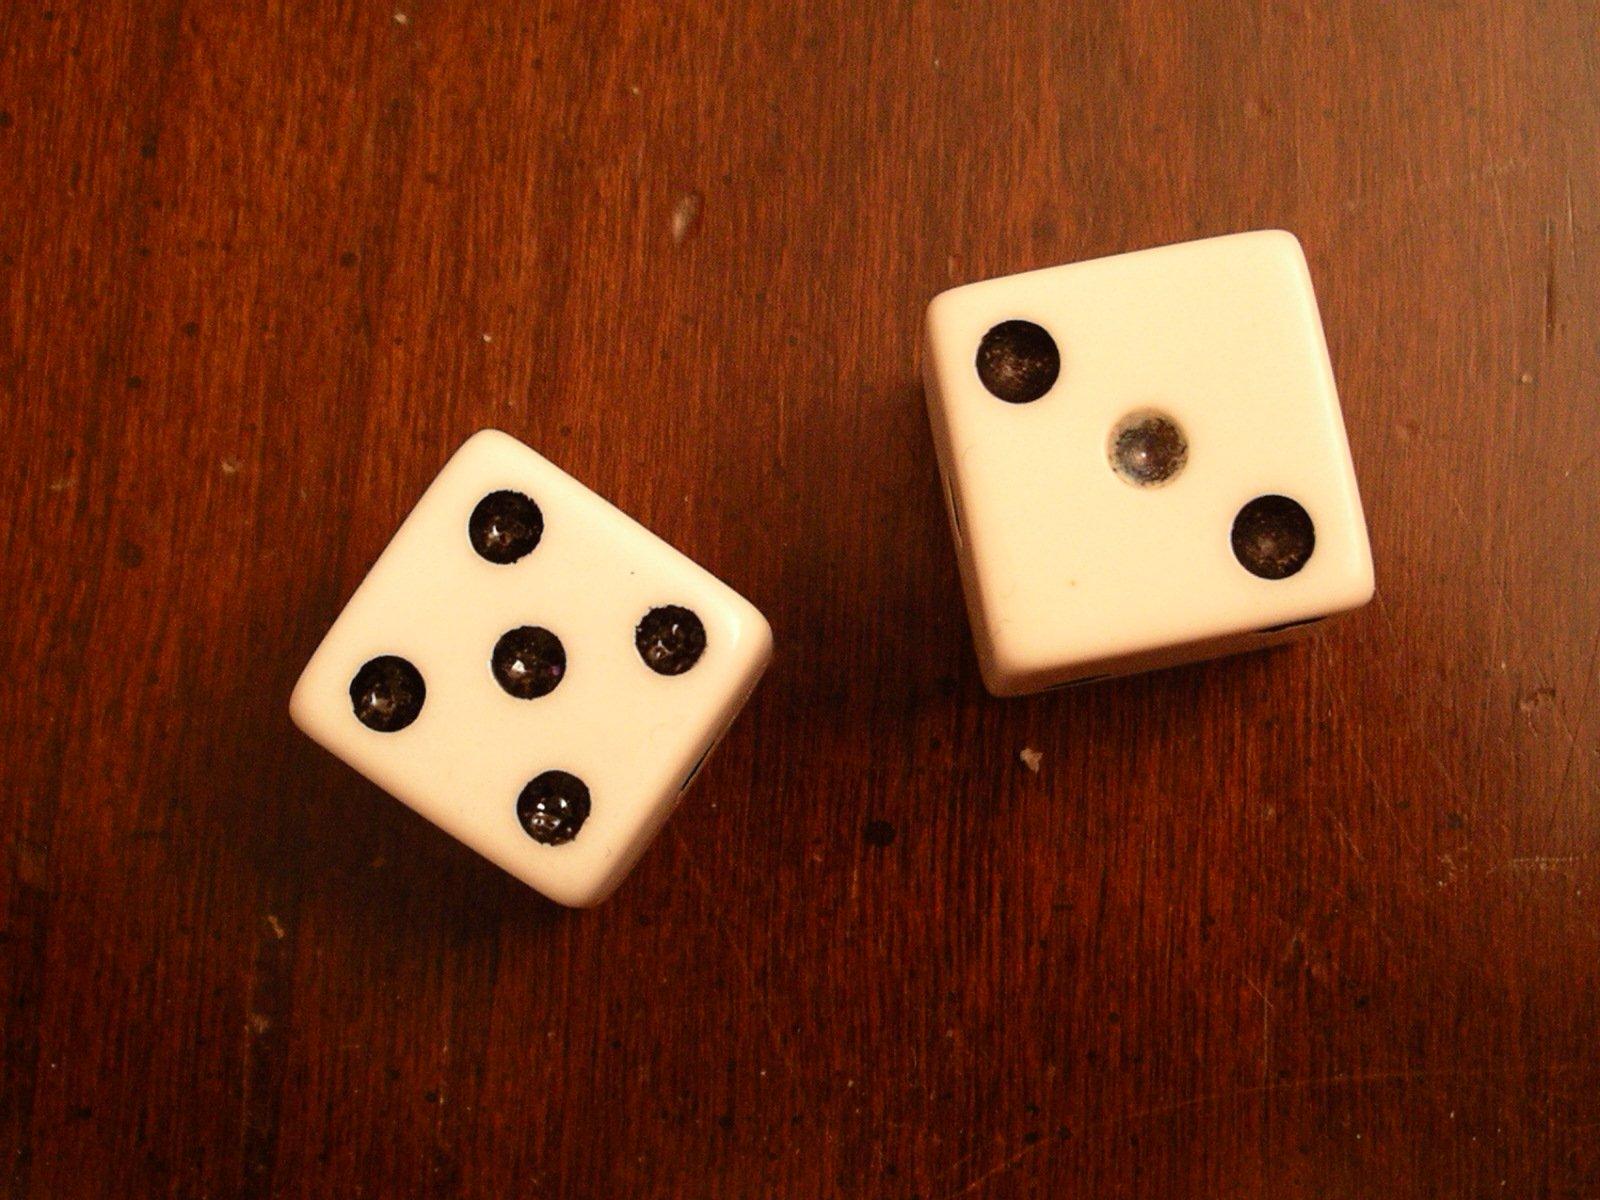 Dice,dice,die,six